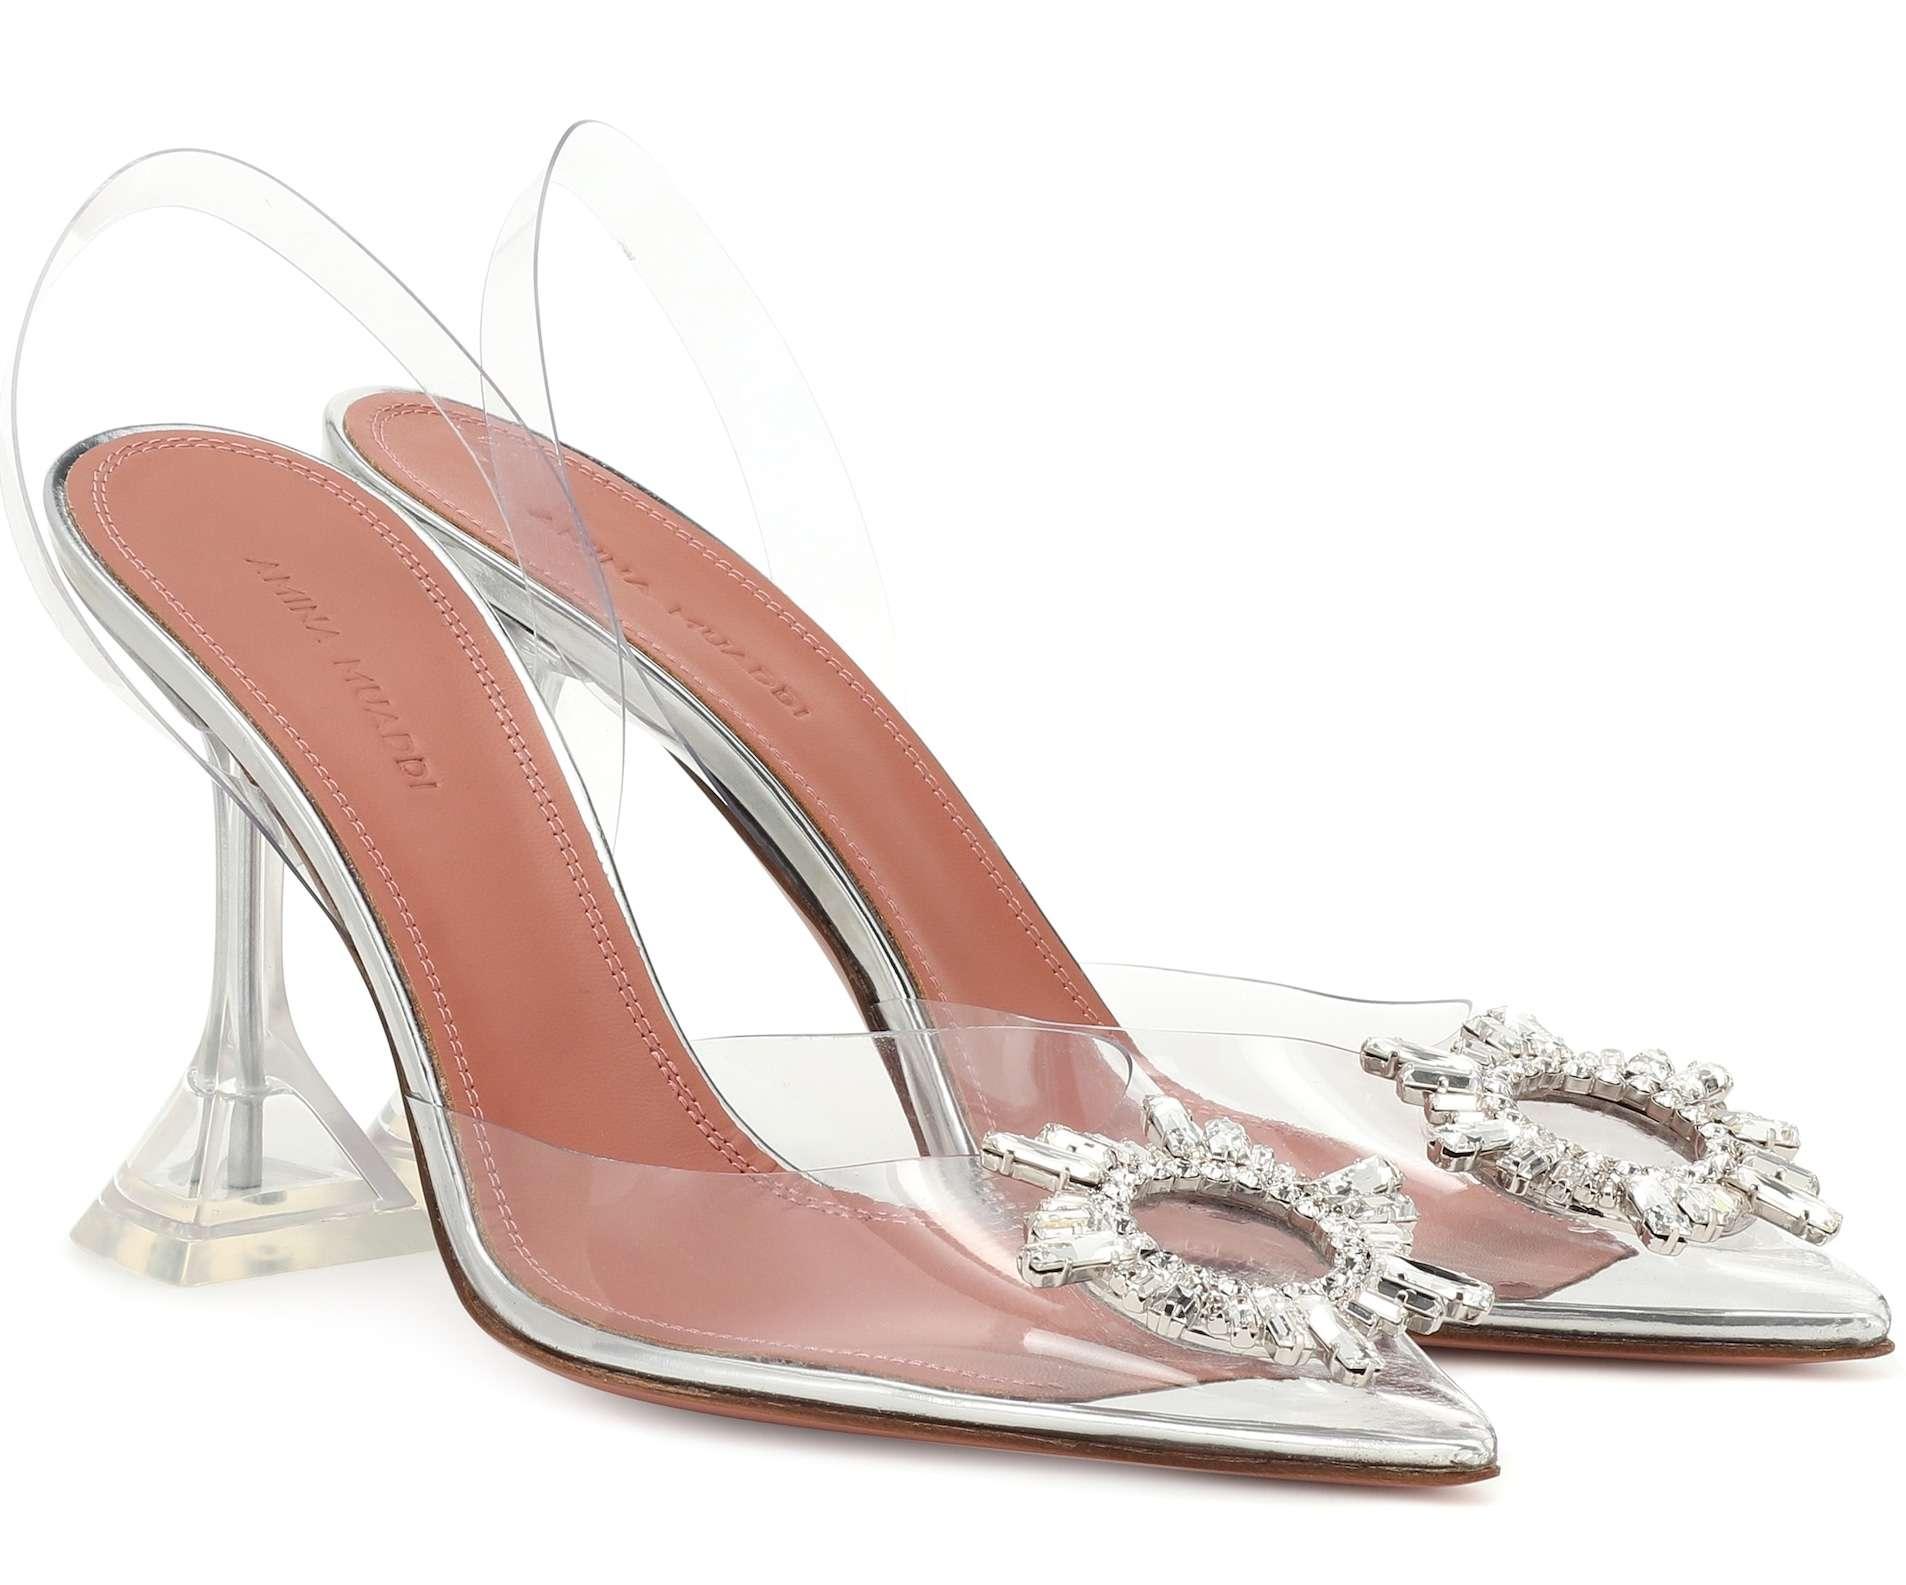 Amina Muaddi Shoes: Are They Worth It